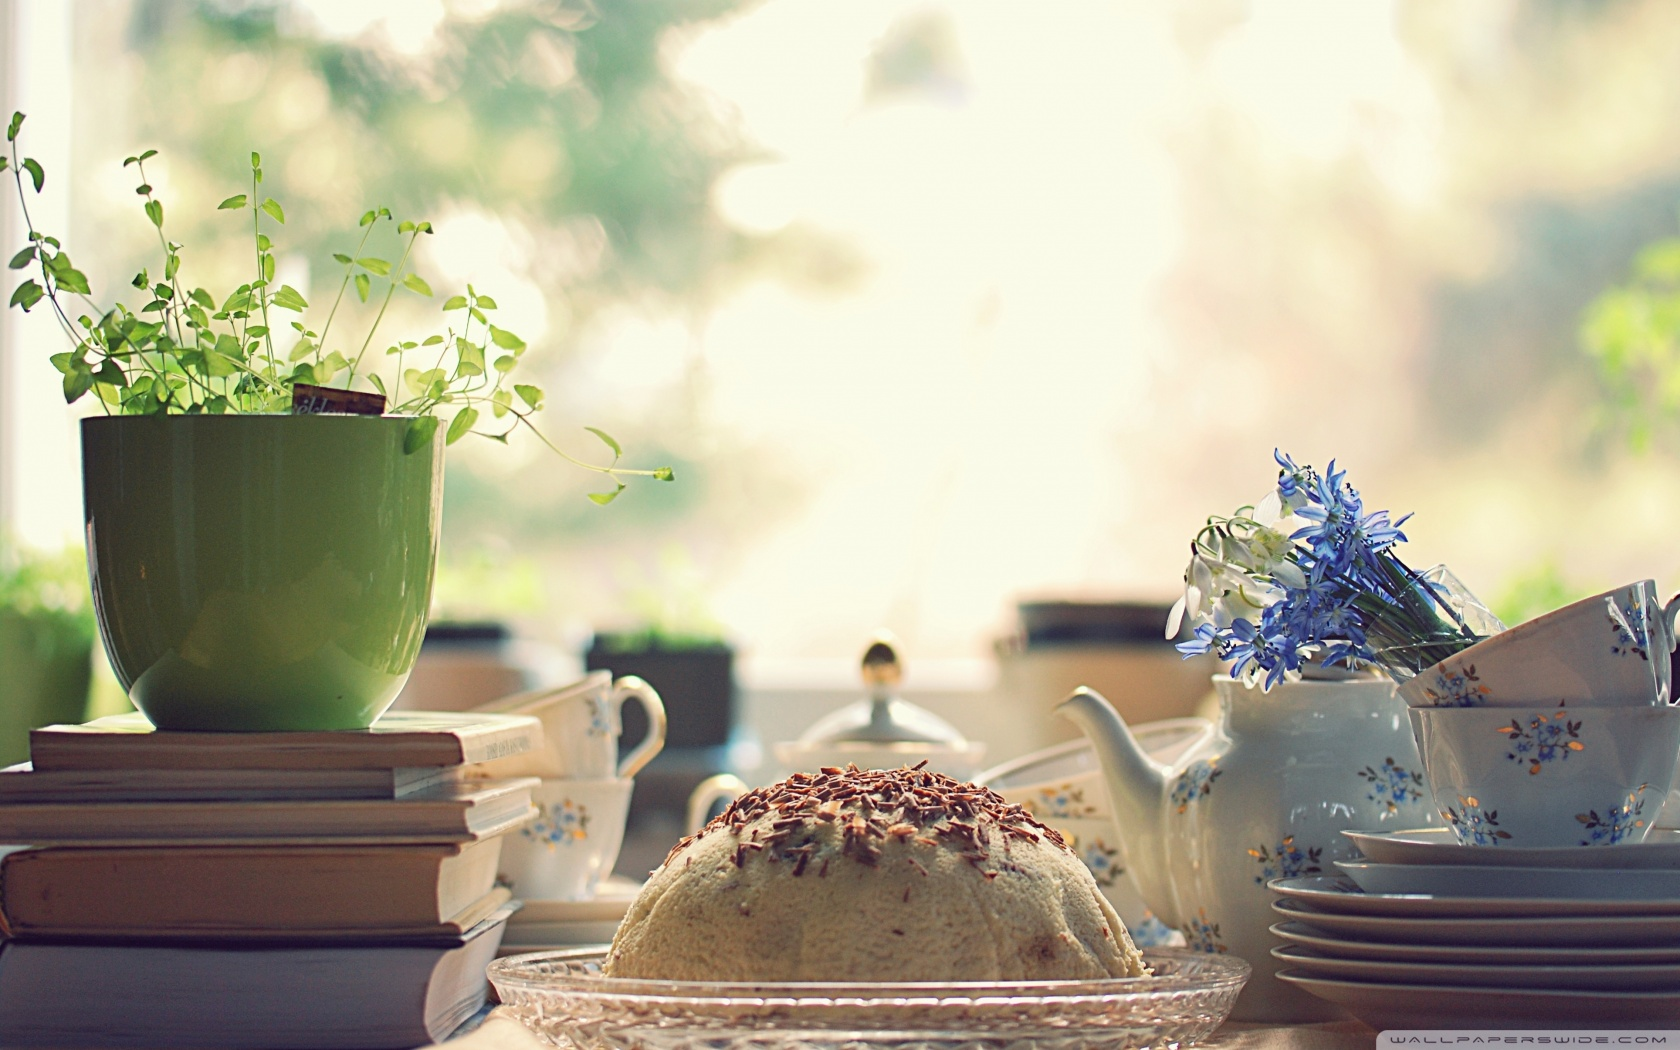 spring_cake-wallpaper-1680x1050.jpg